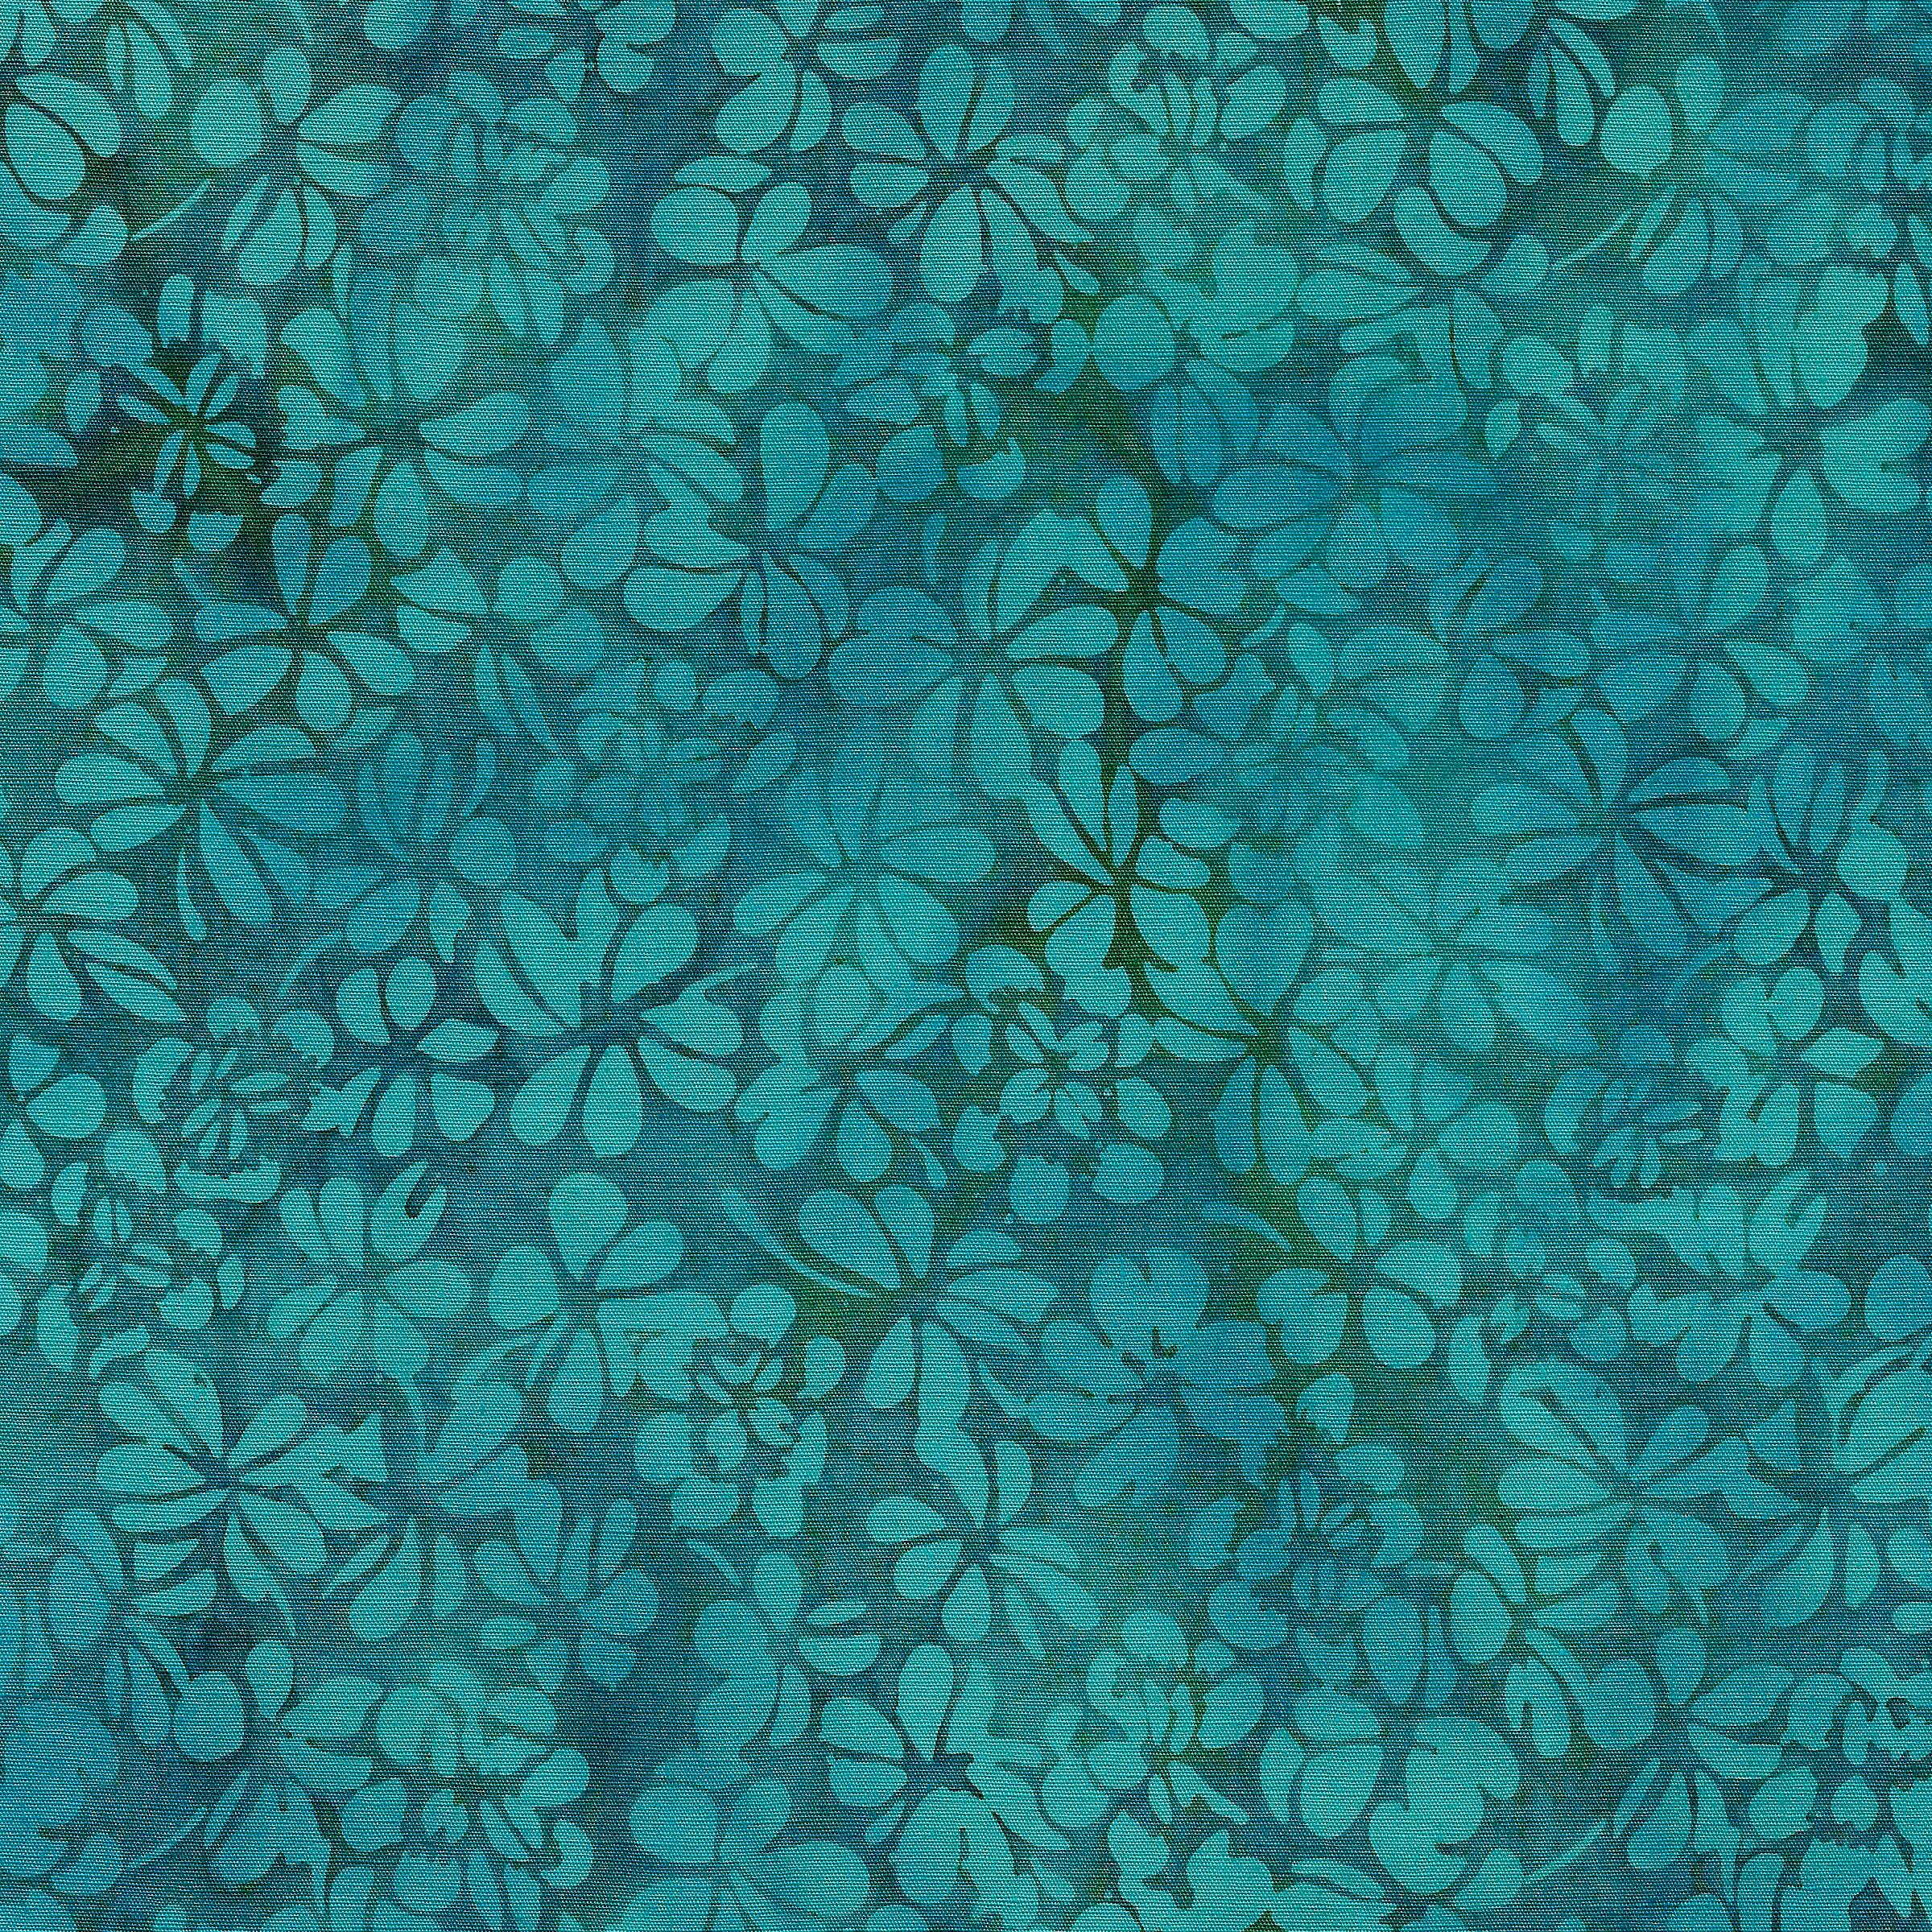 Petal Pushers - Clover, Bermuda 111932610 - by Kathy Engle for Island Batik